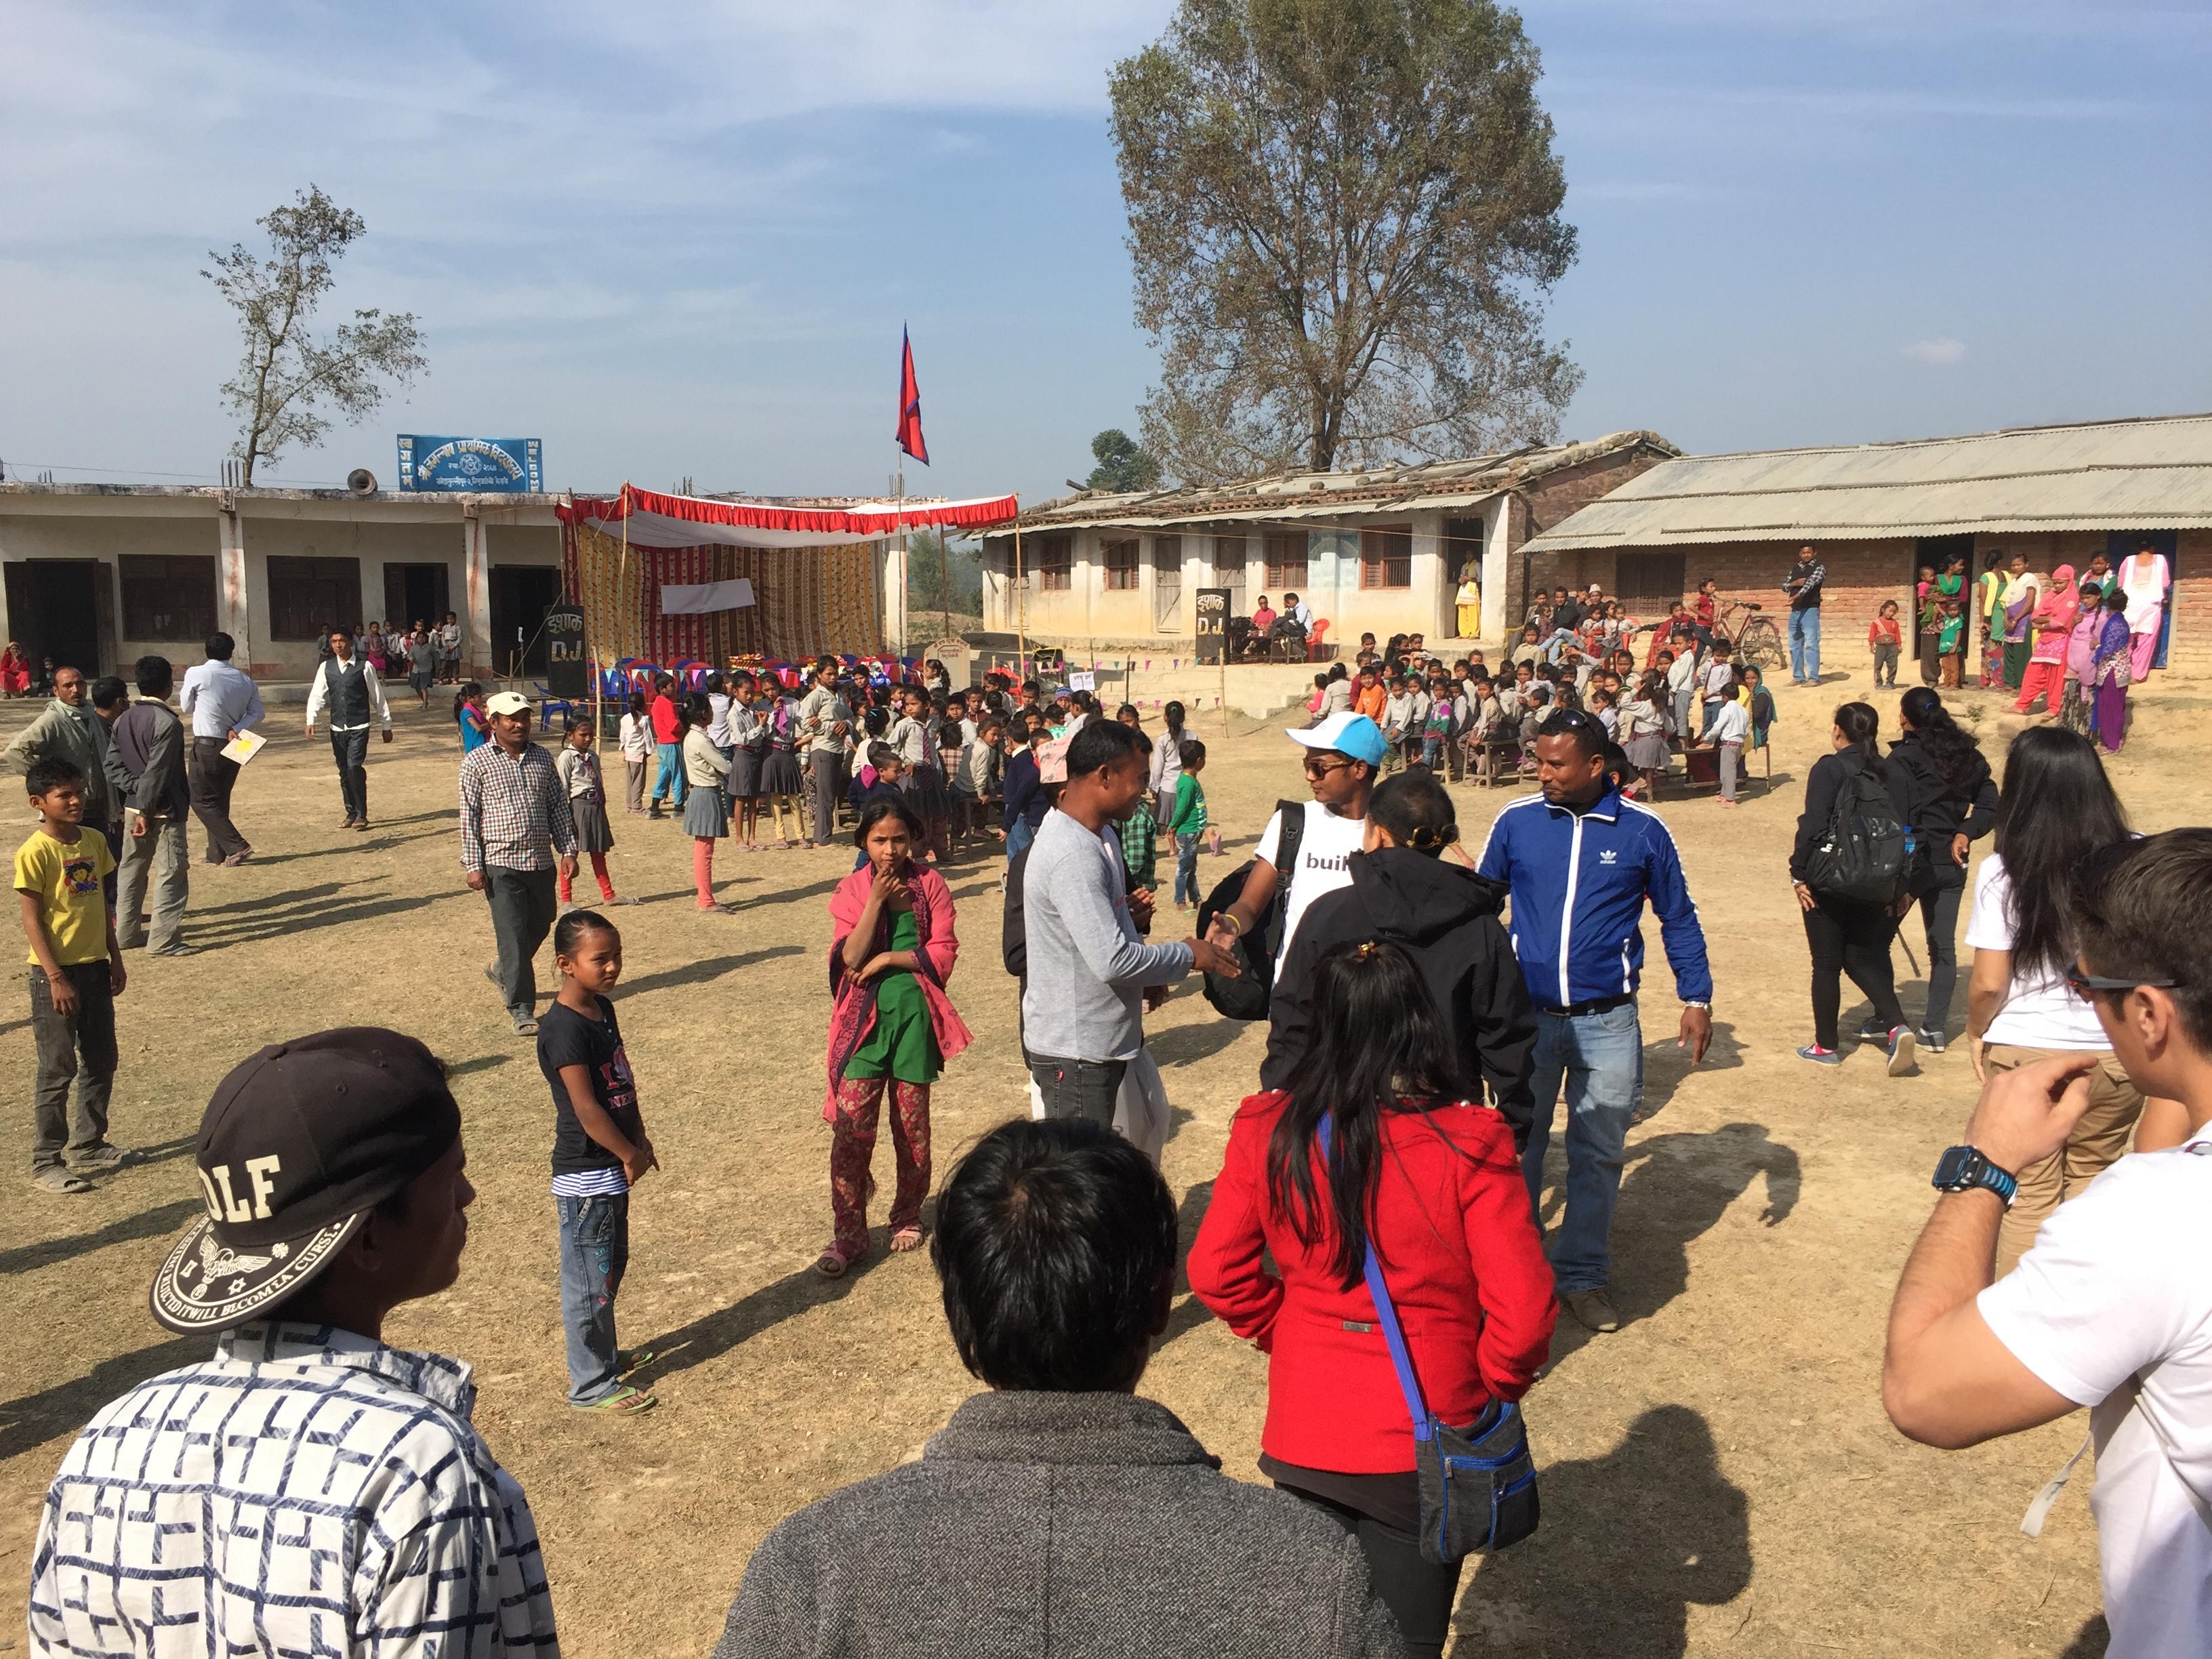 Arriving in the village of Nimuwaboji, Nepal